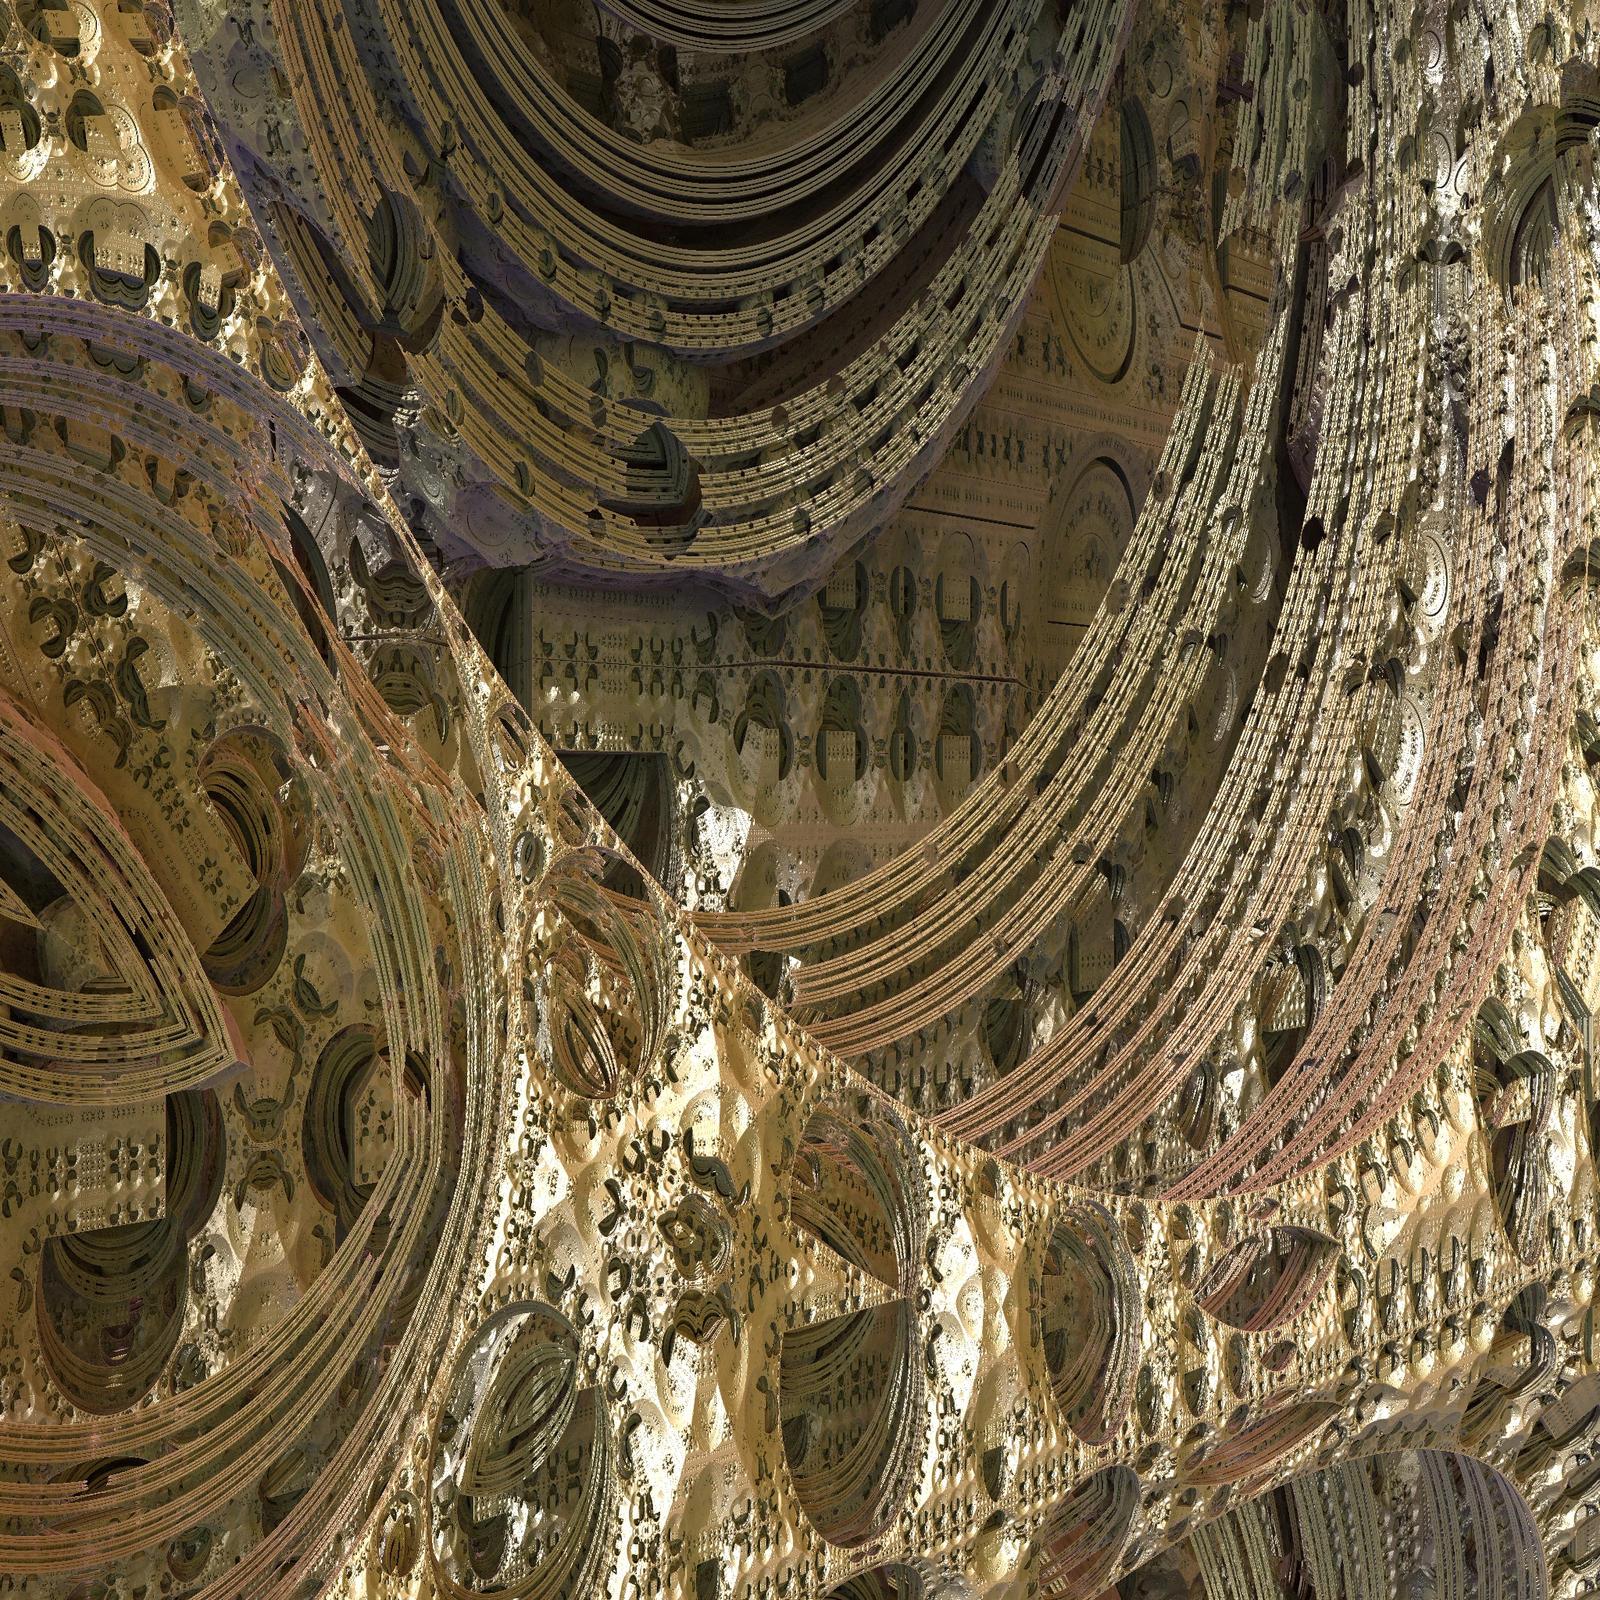 Inside Tglad's Cube by KrzysztofMarczak